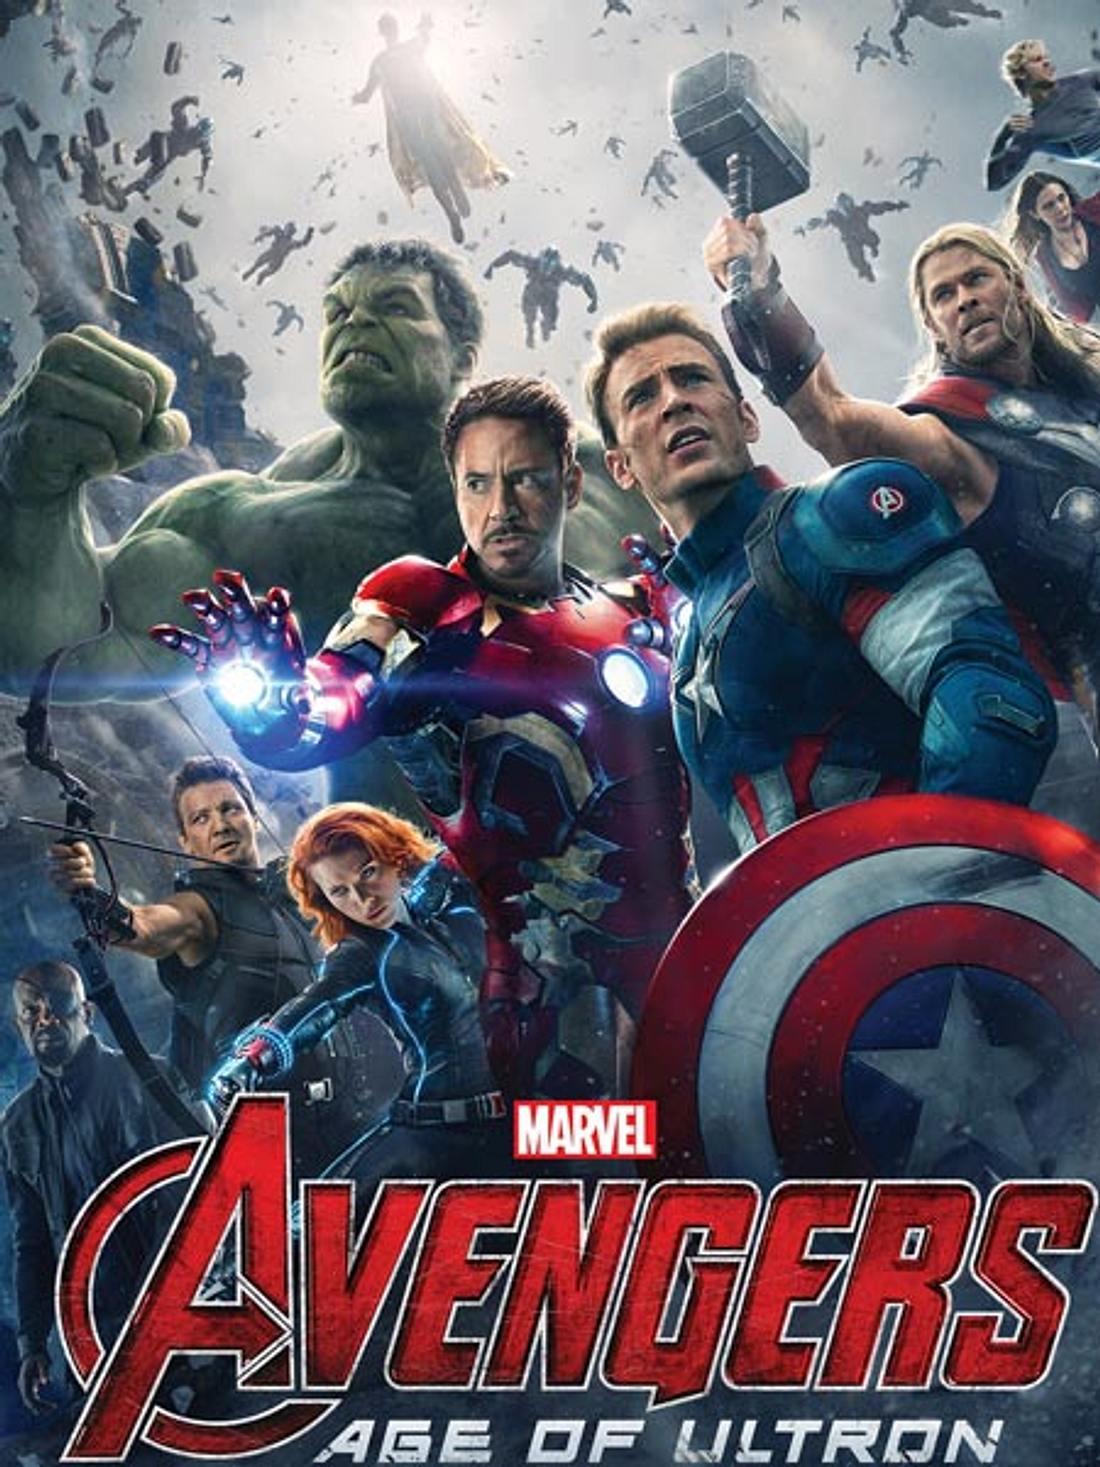 Avengers 2: Age of Ultron - 10 unglaubliche Fakten zum Mega-Blockbuster